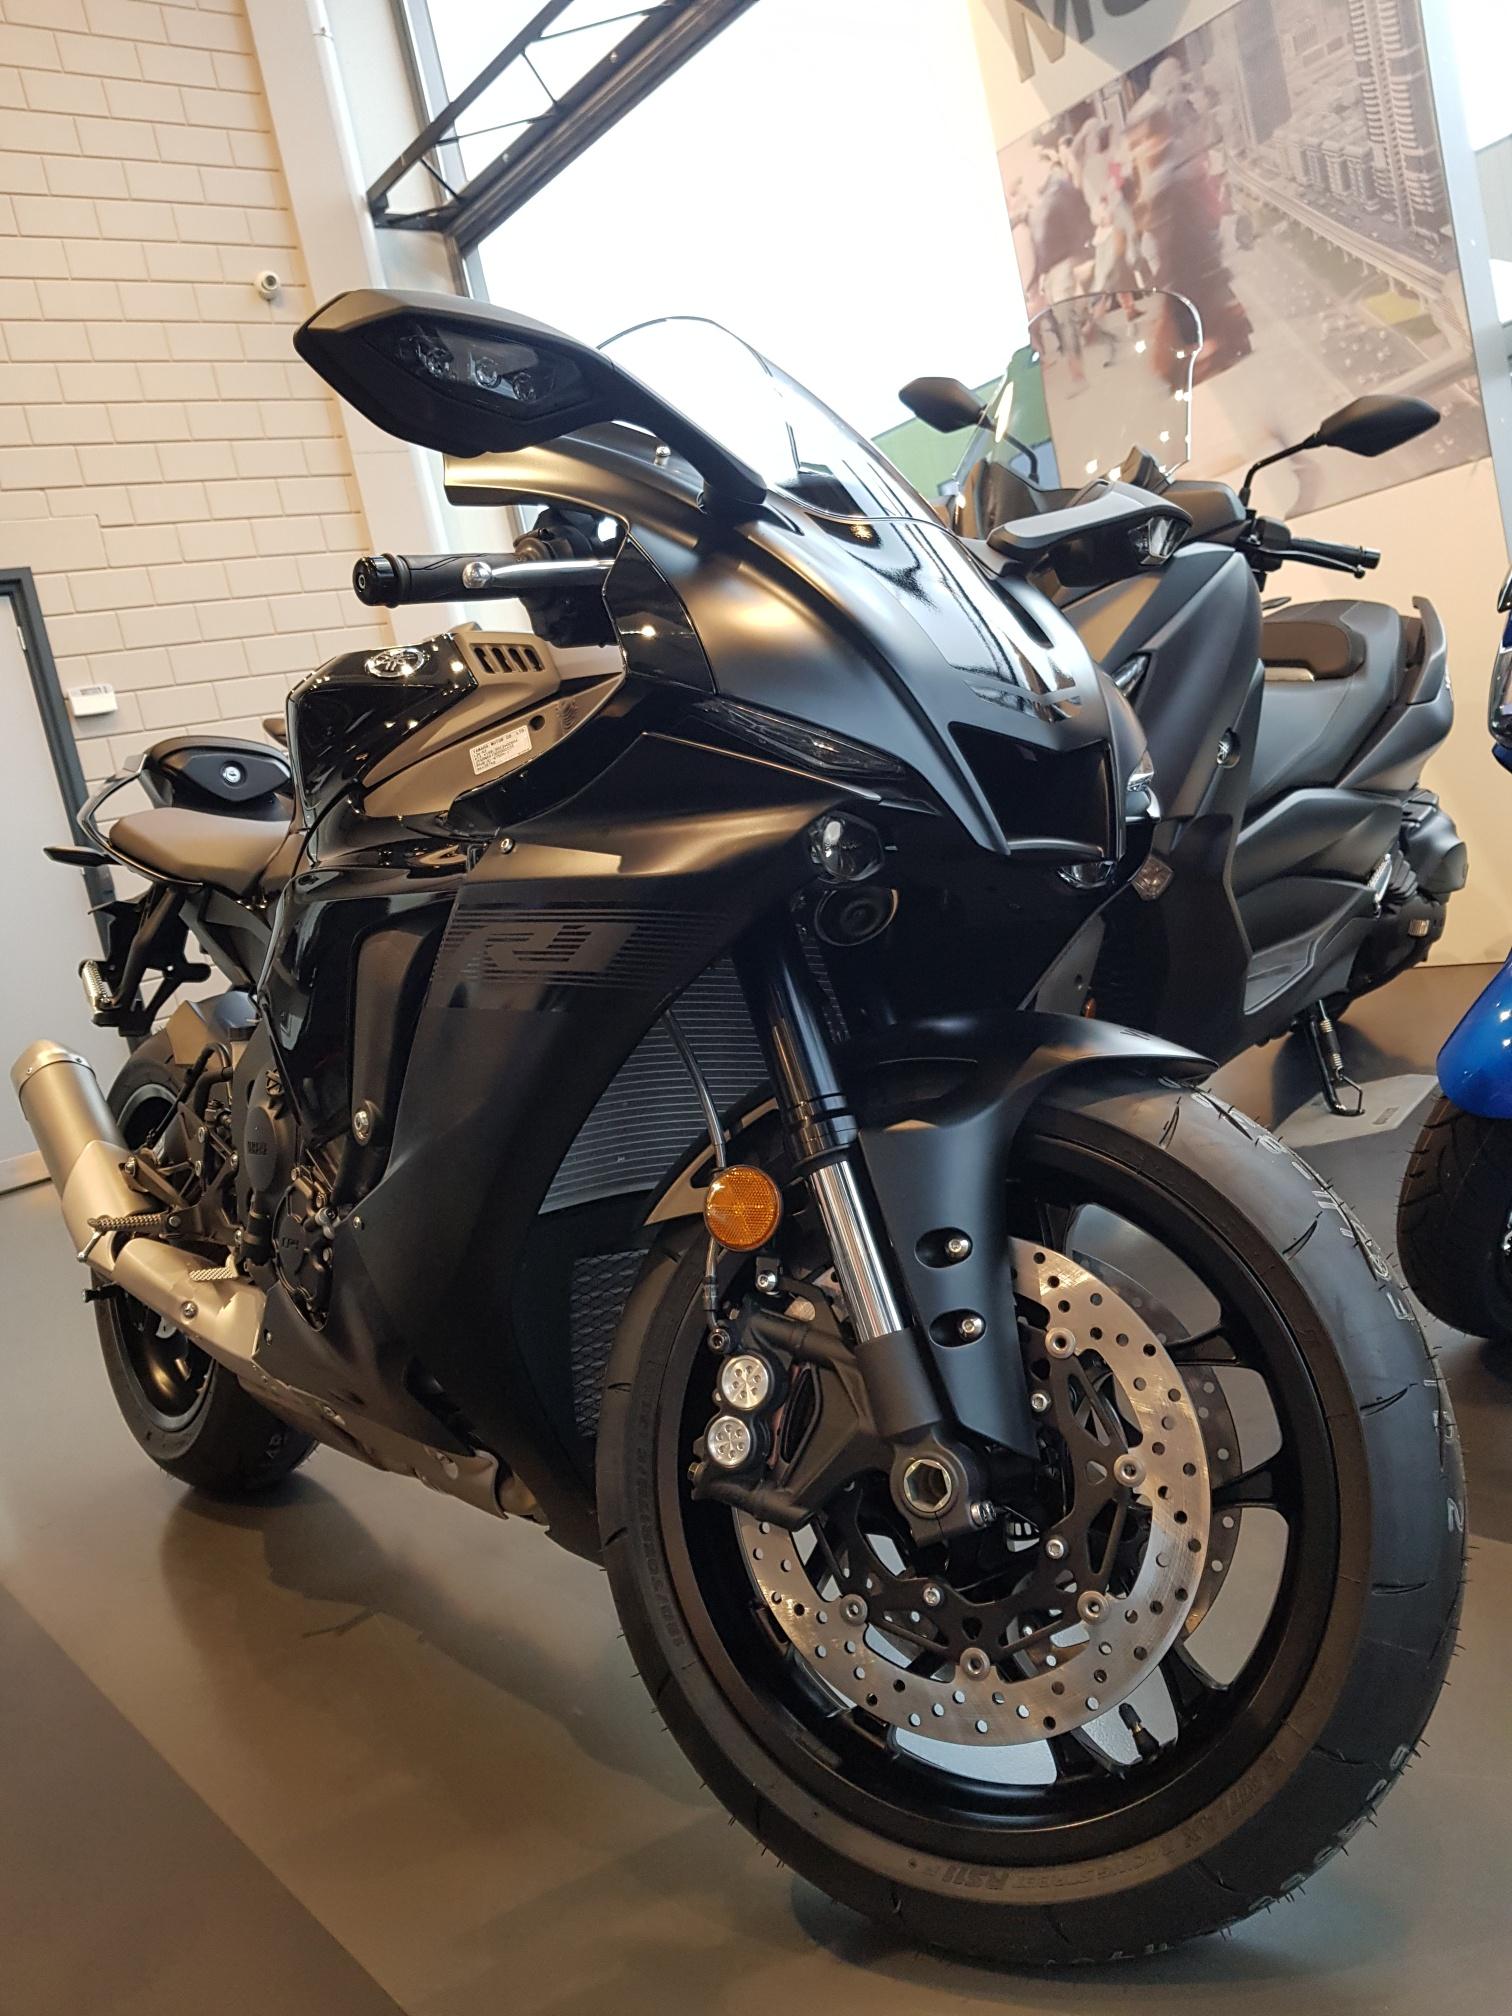 Yamaha YZF-R1 model 2020 | MotorCentrumWest